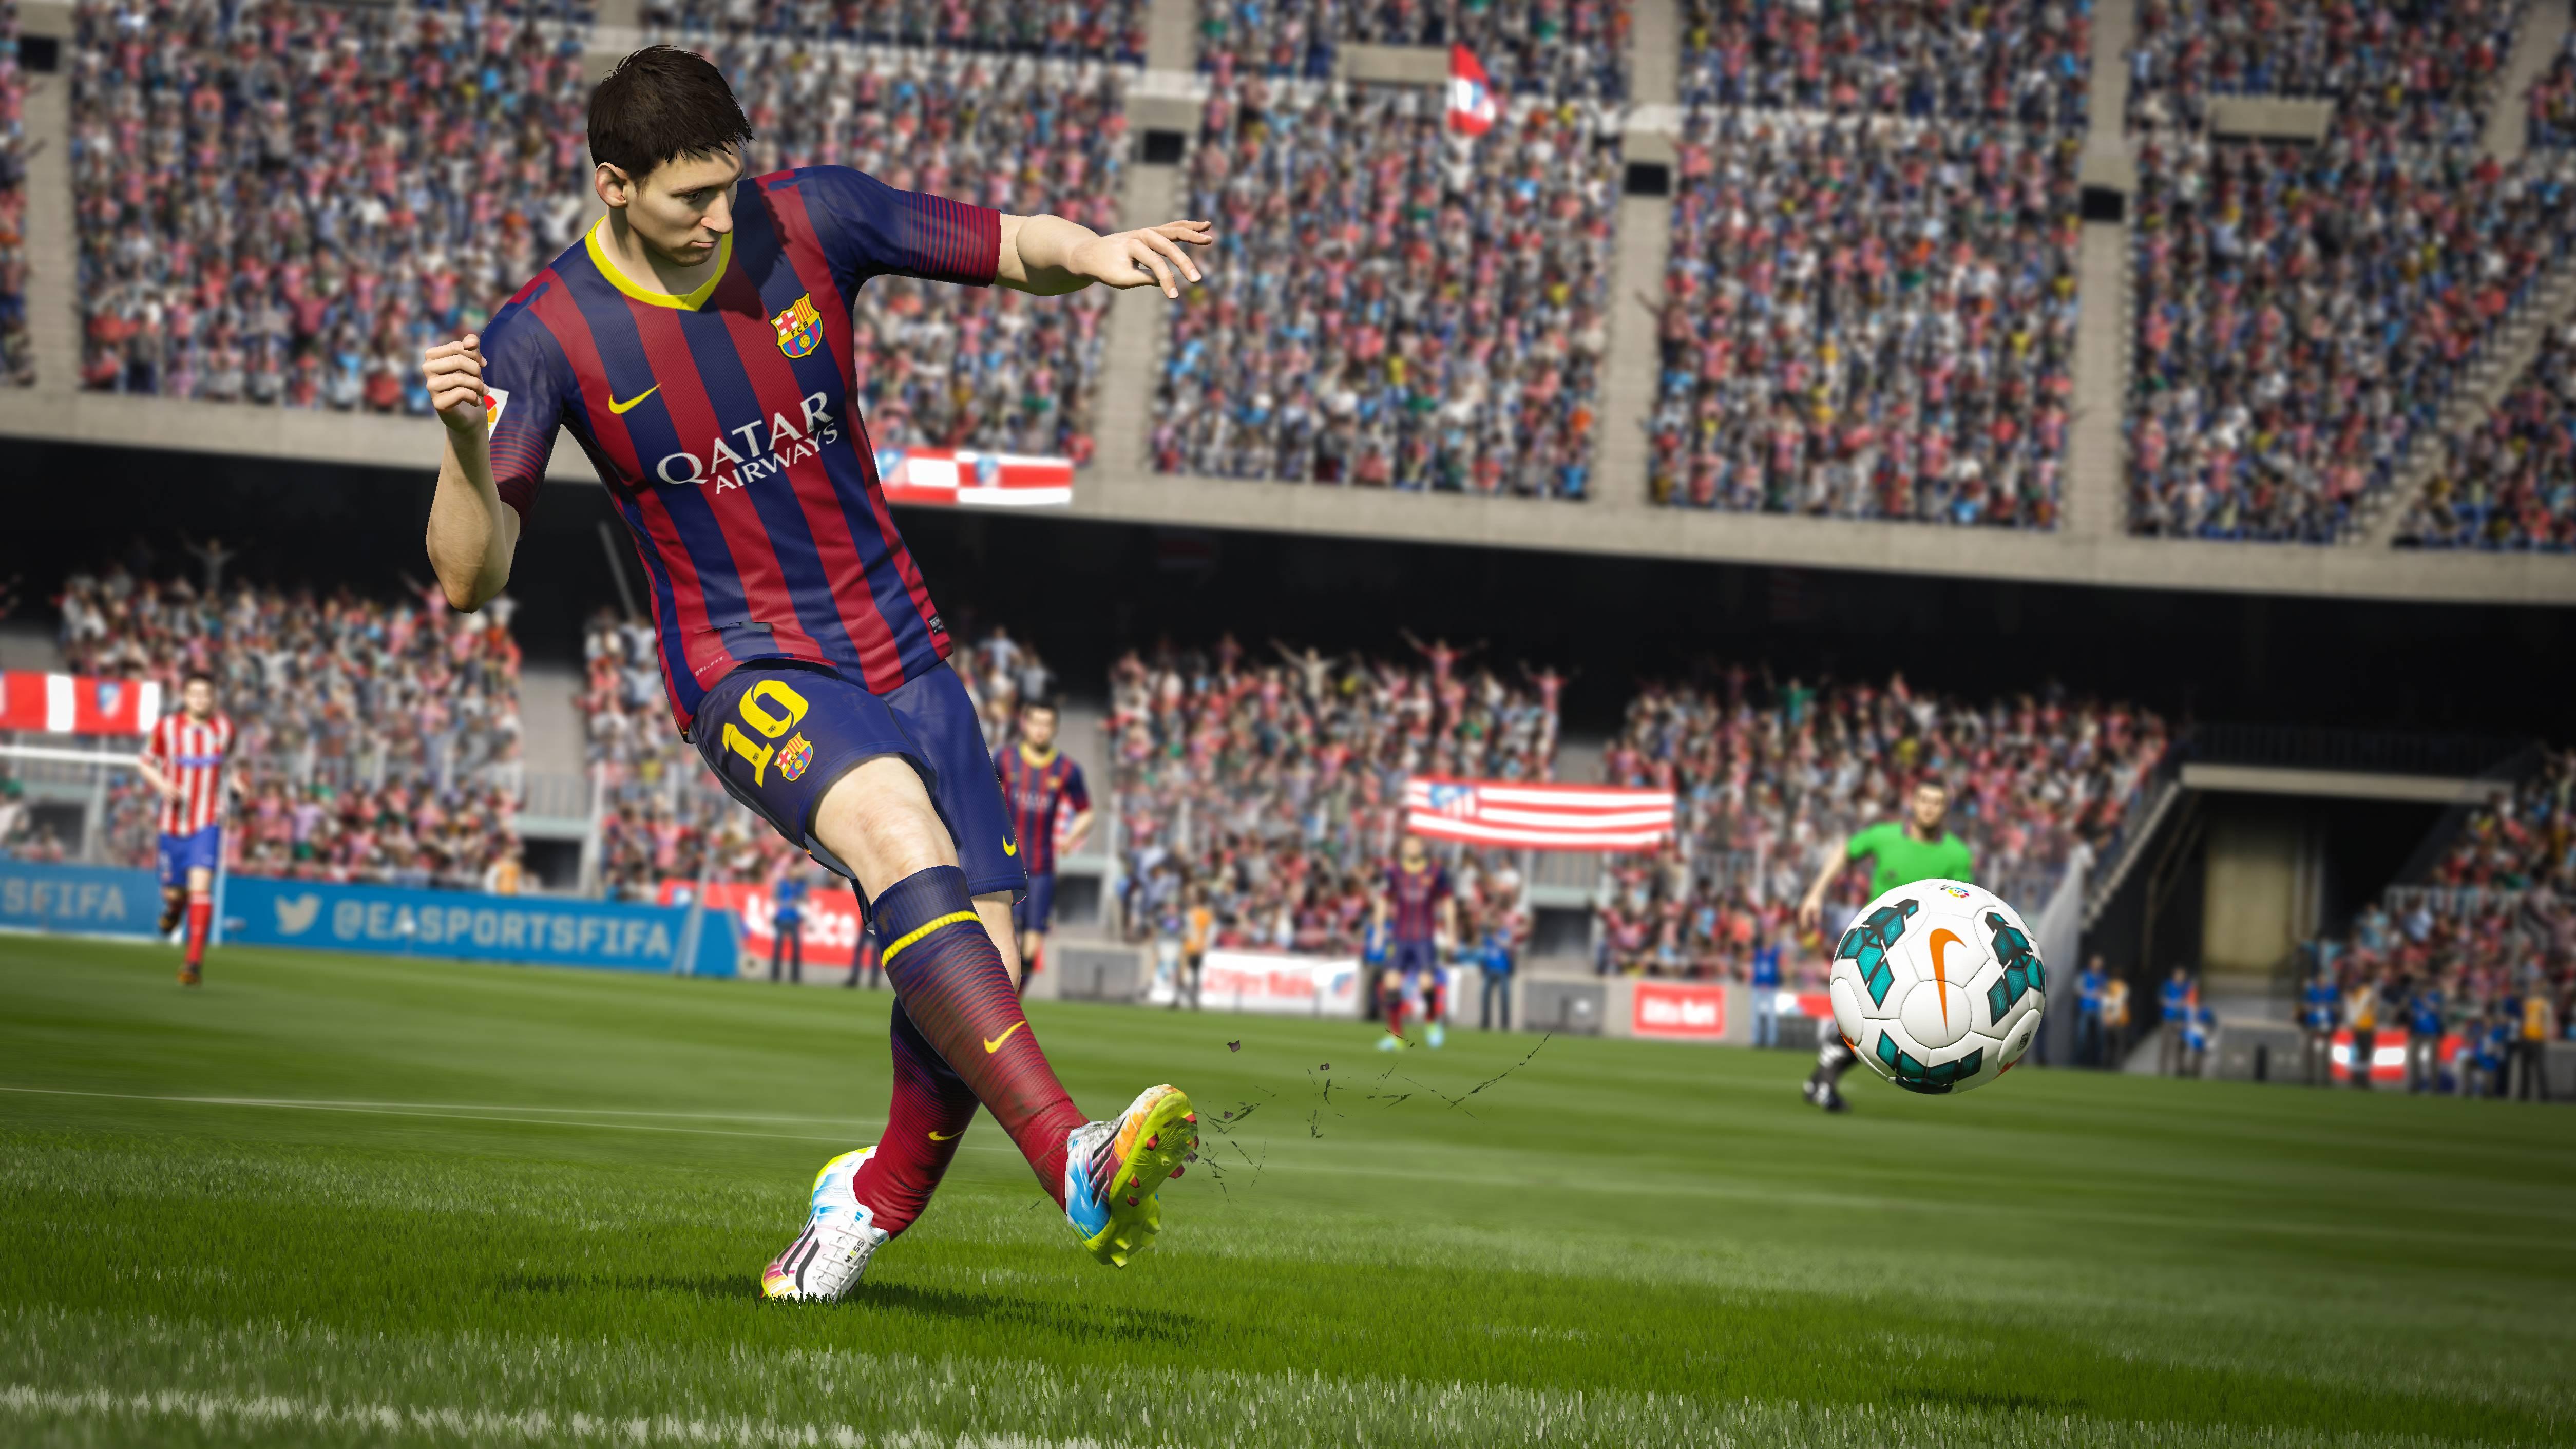 Download <b>FIFA 15 Wallpaper HD</b> 1041 3840x2160 px High Resolution ...